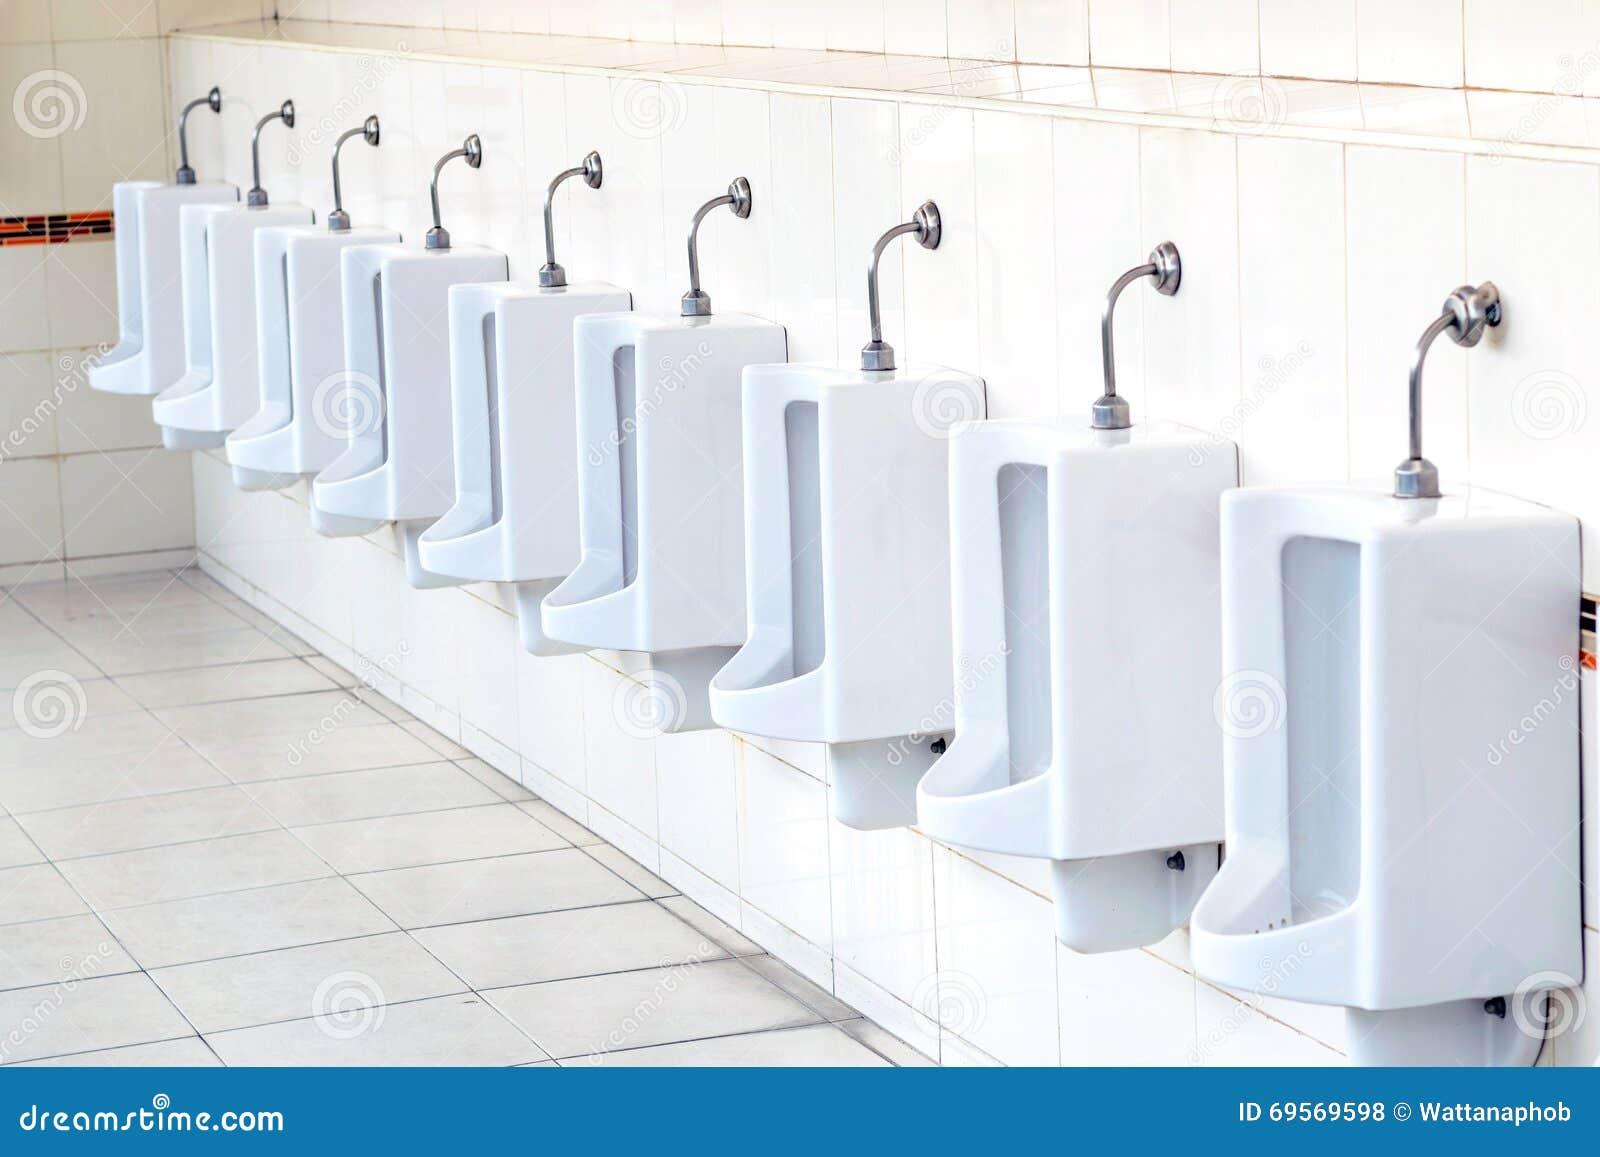 White urinals in men39s bathroom stock photo image 69569598 for Men in bathrooms